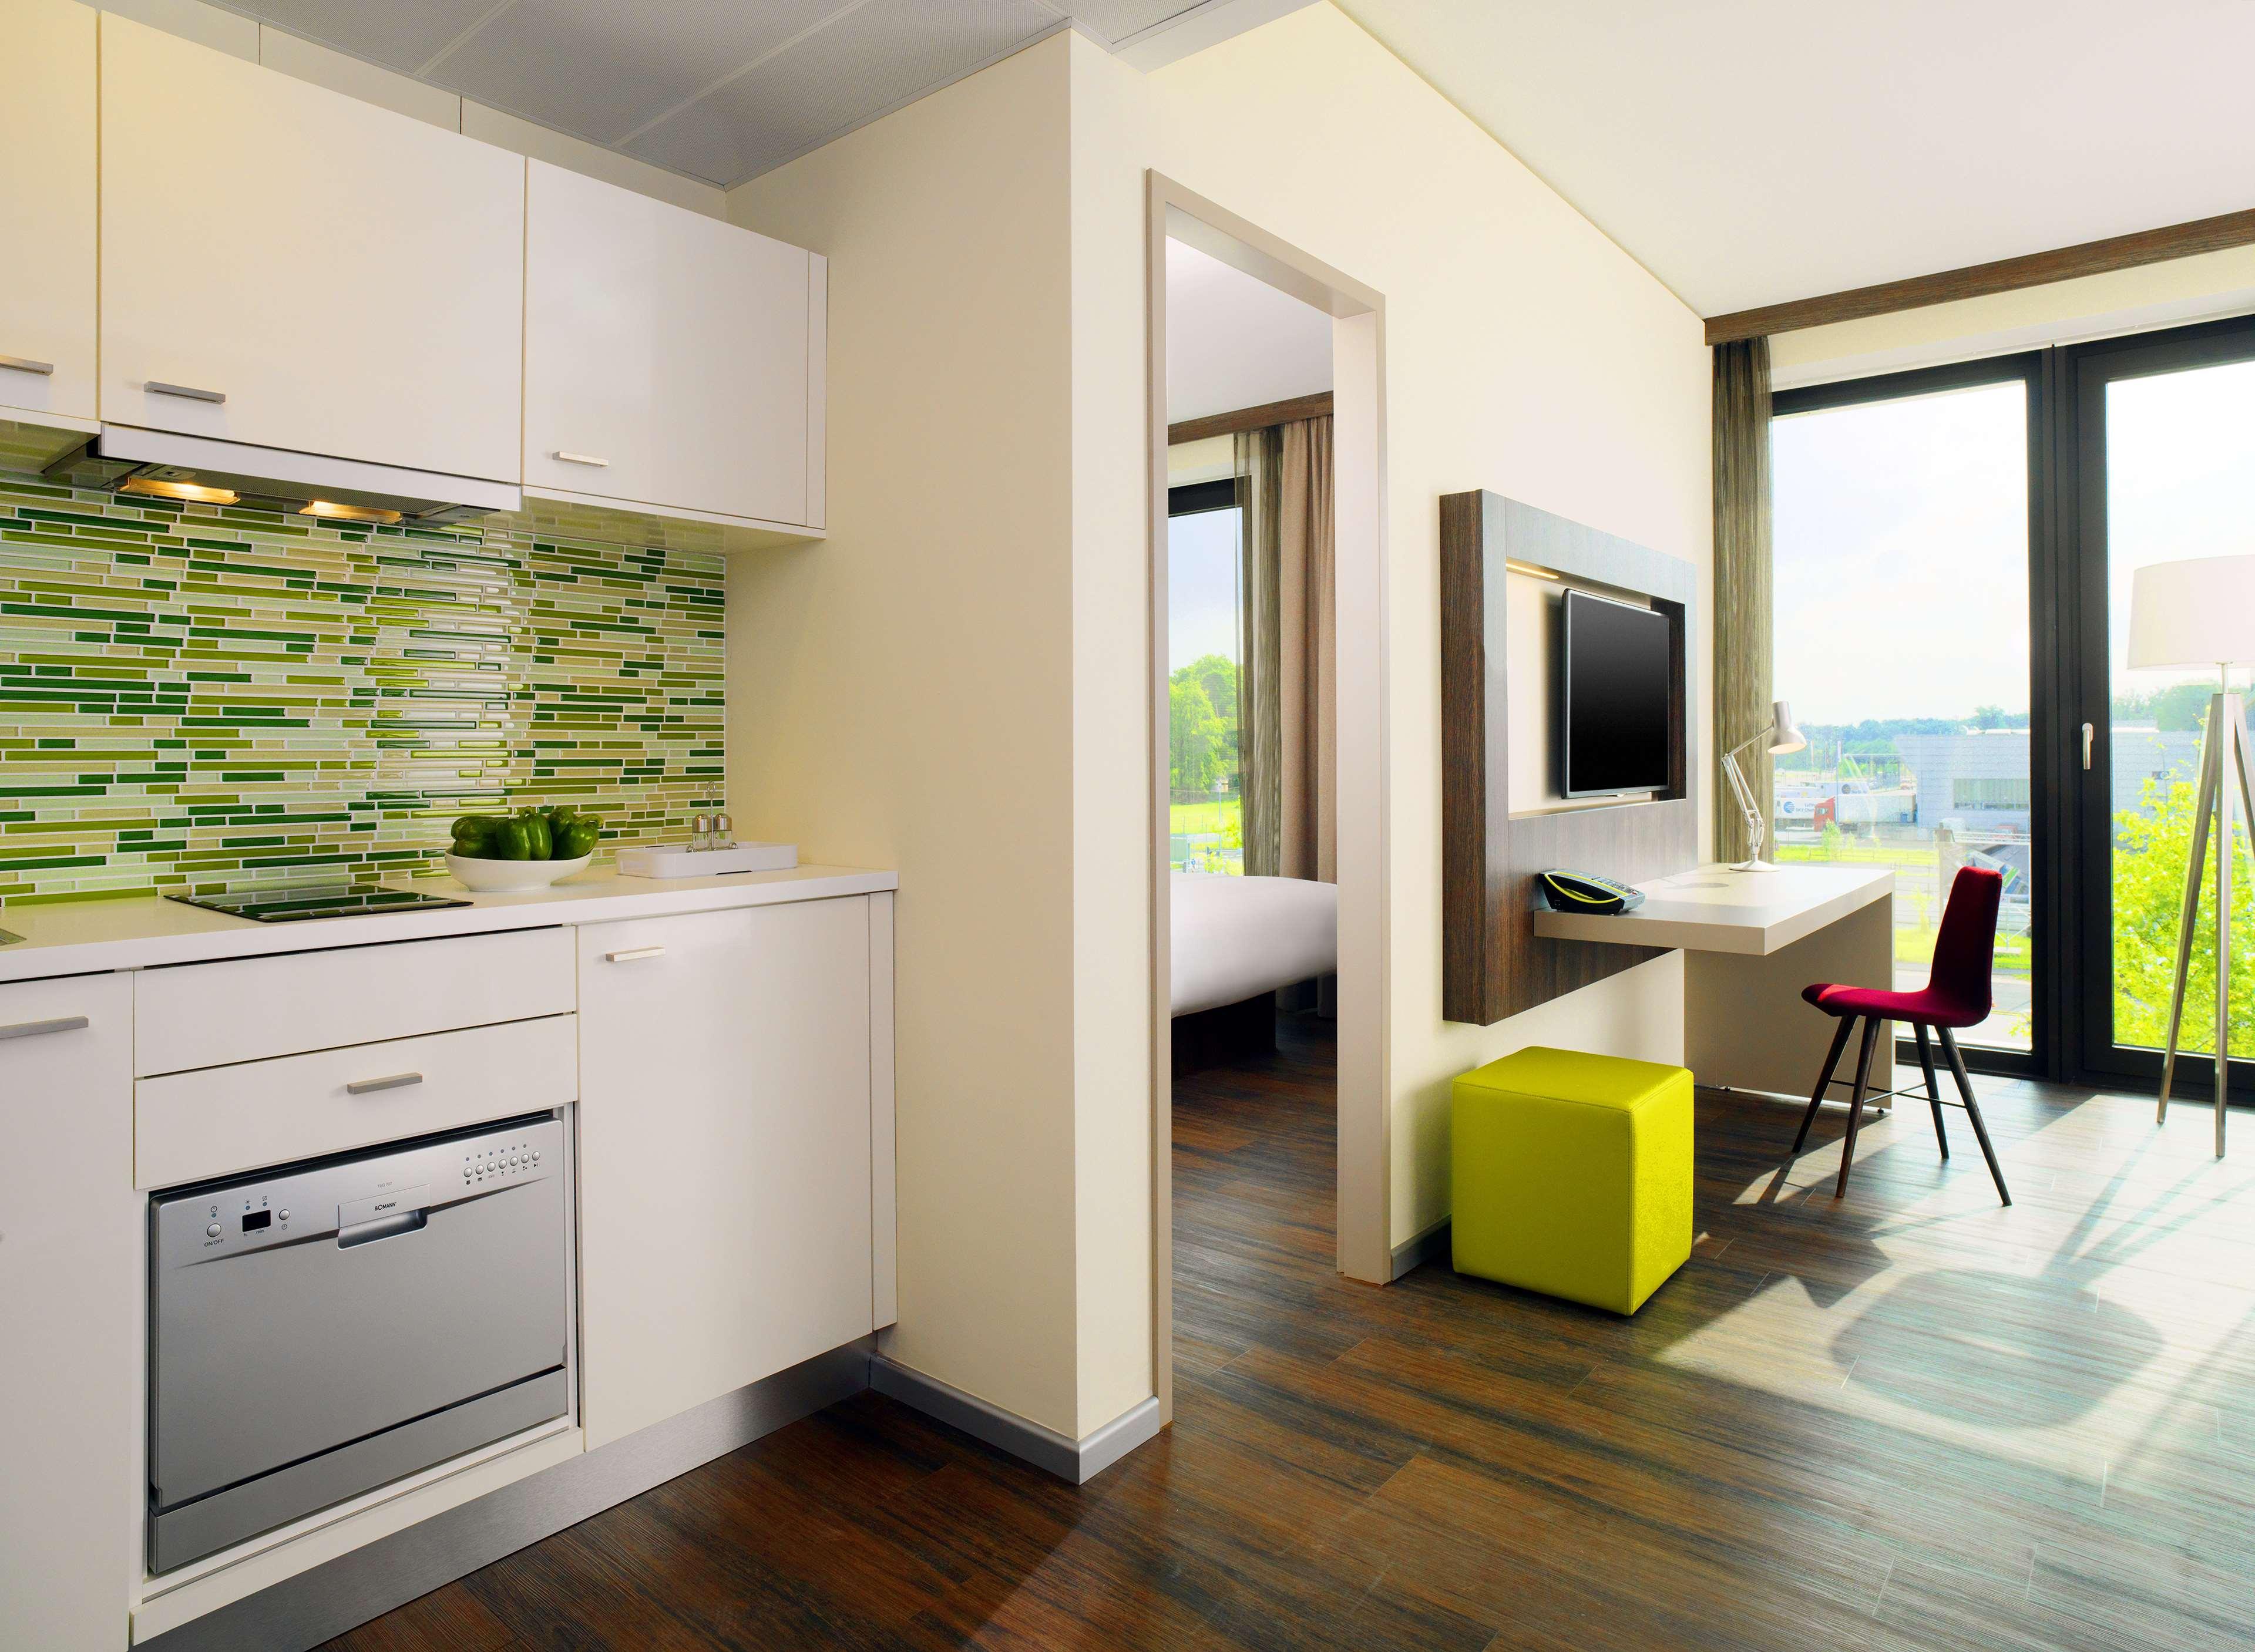 element frankfurt airport hotels hotels restaurants frankfurt deutschland tel 069365065. Black Bedroom Furniture Sets. Home Design Ideas